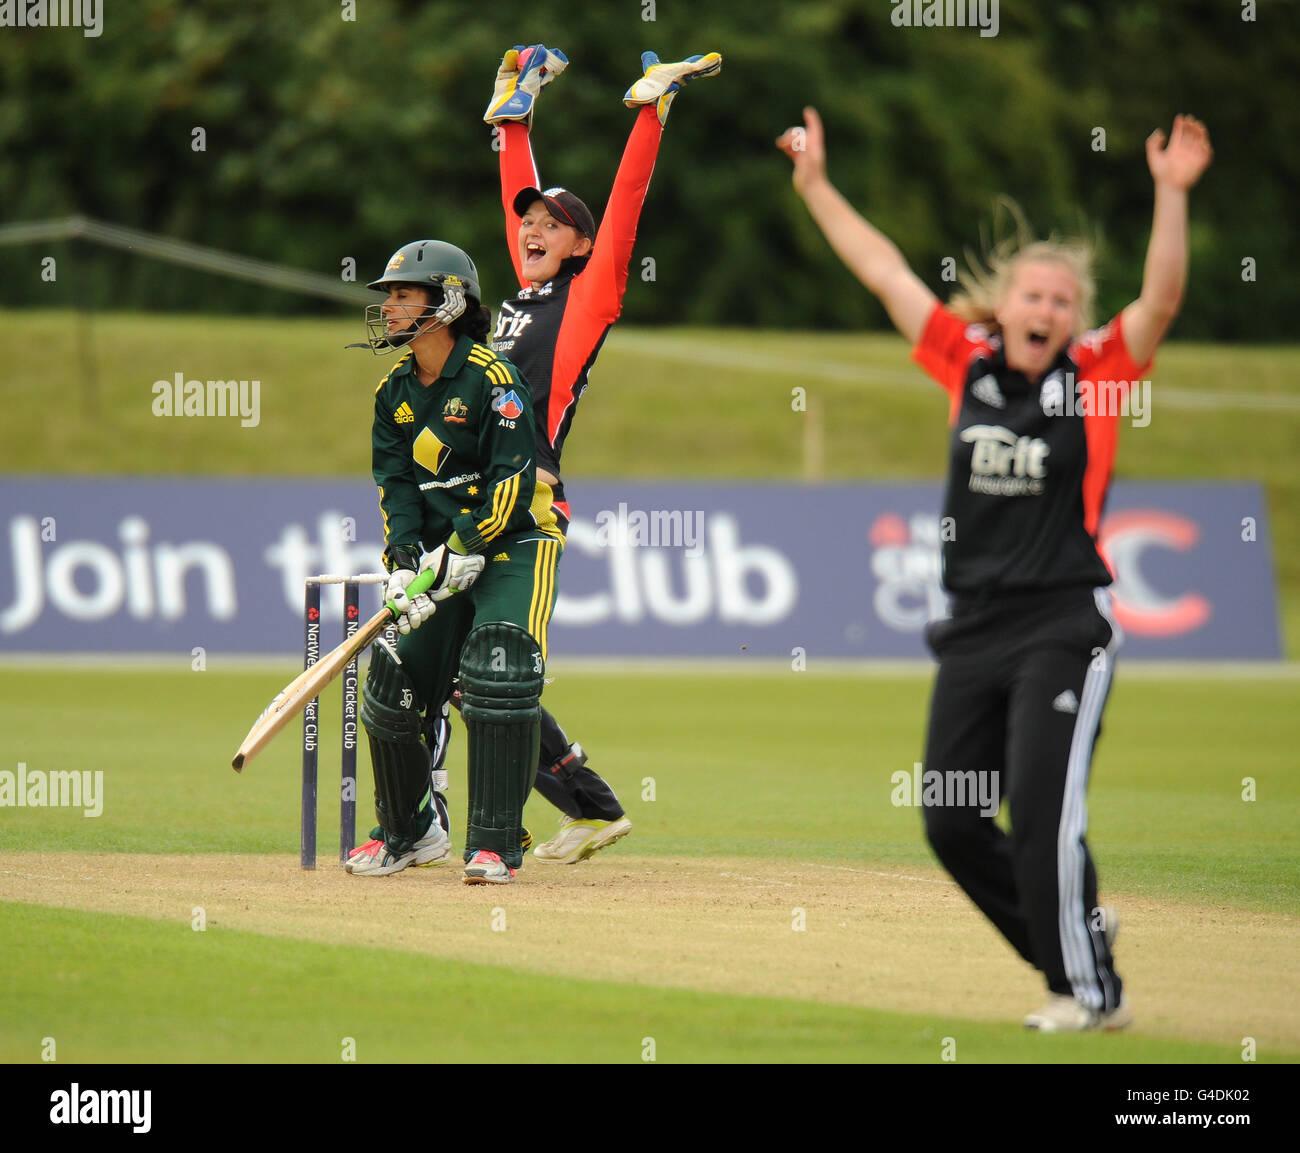 Cricket - Natwest Women's Quadrangular Twenty20 - Final - England v Australia - Sir Paul Getty's Ground - Stock Image